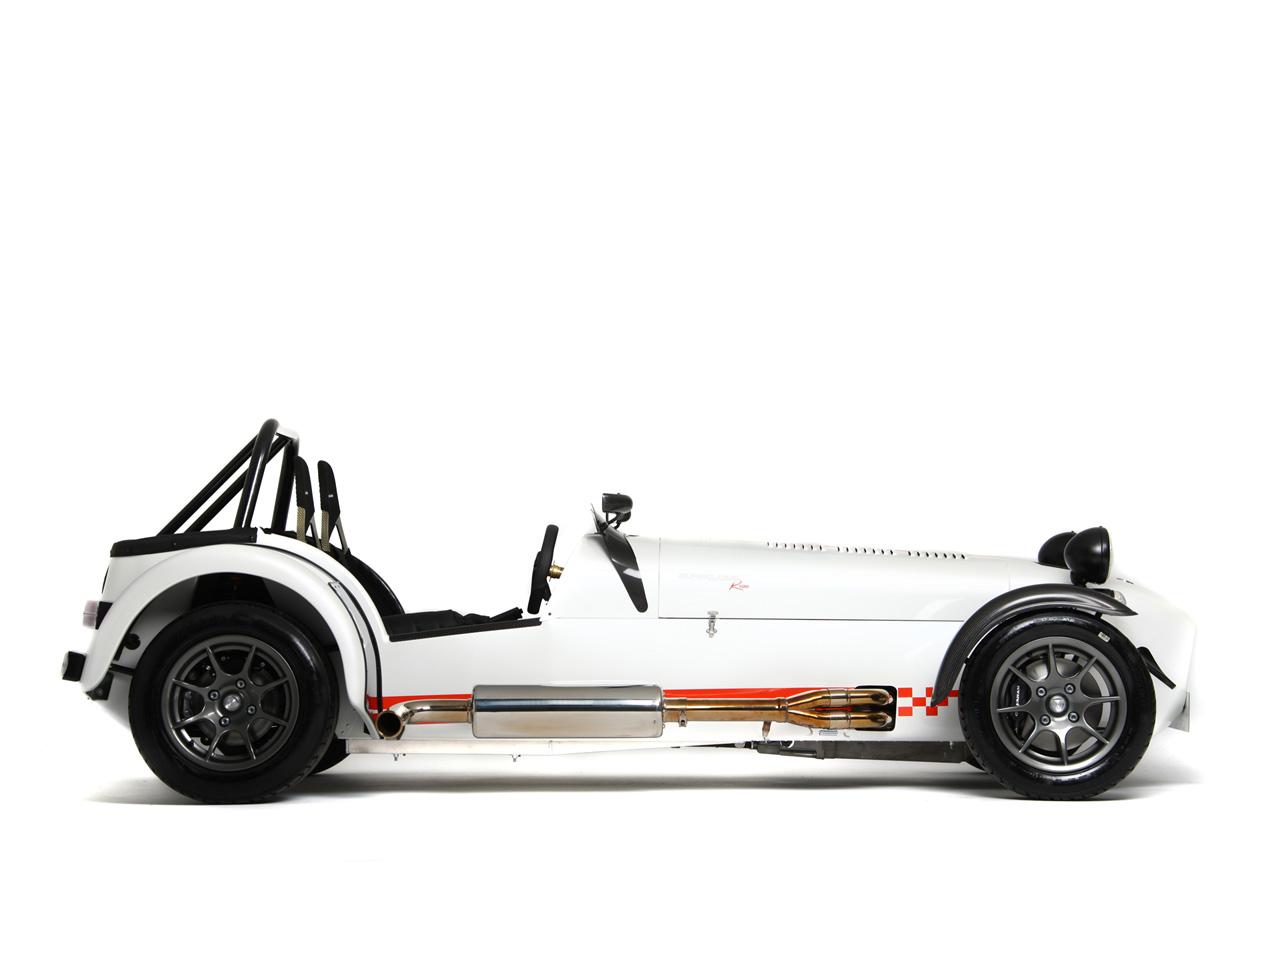 car specs review 2008 caterham 7 rst v8 specs engine review. Black Bedroom Furniture Sets. Home Design Ideas